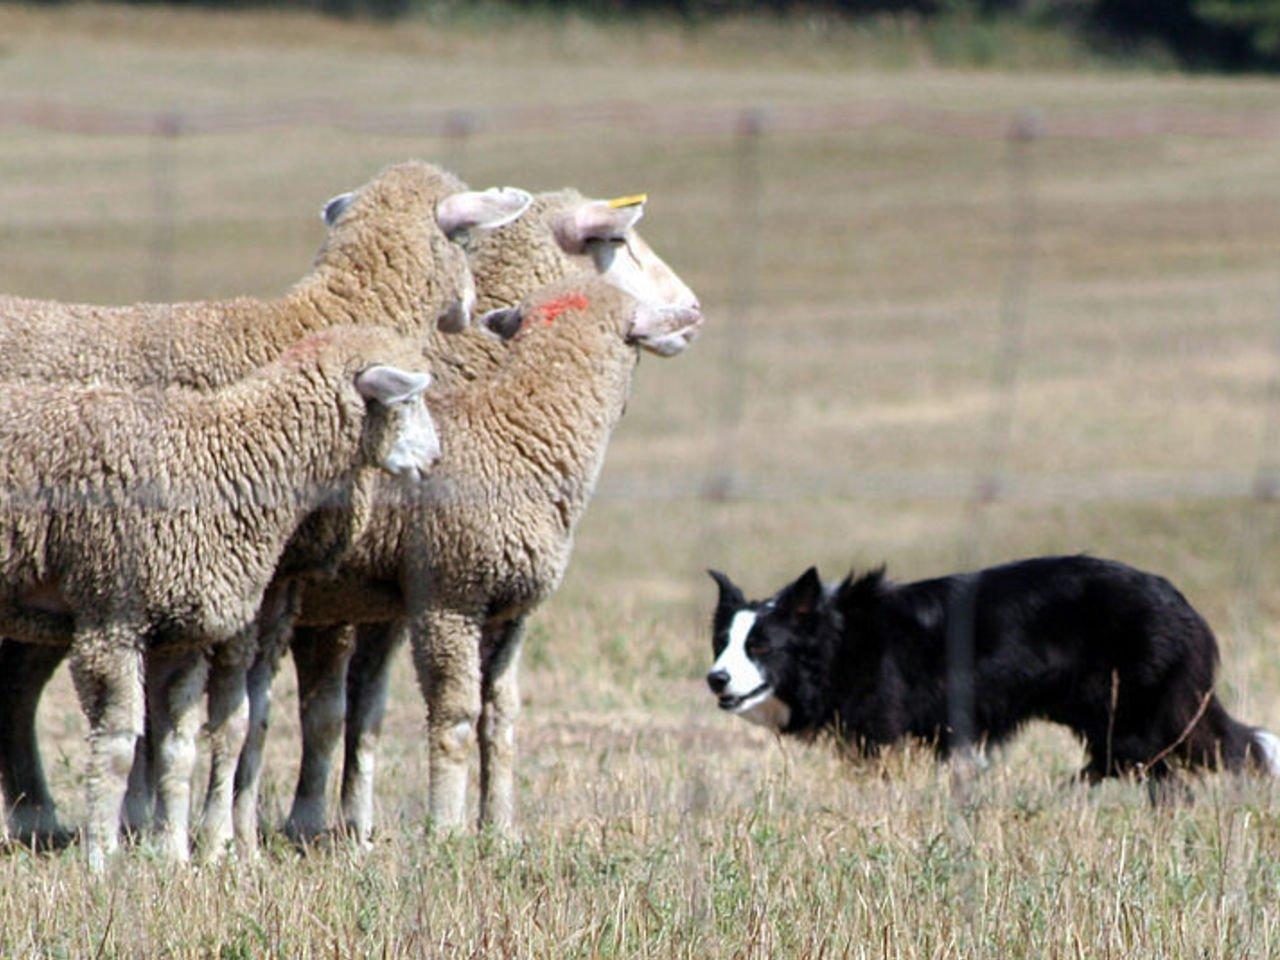 SHEPHERD (Sheep Herding, Electronic Protector, and Hazard Encountering Robotic Defender.)